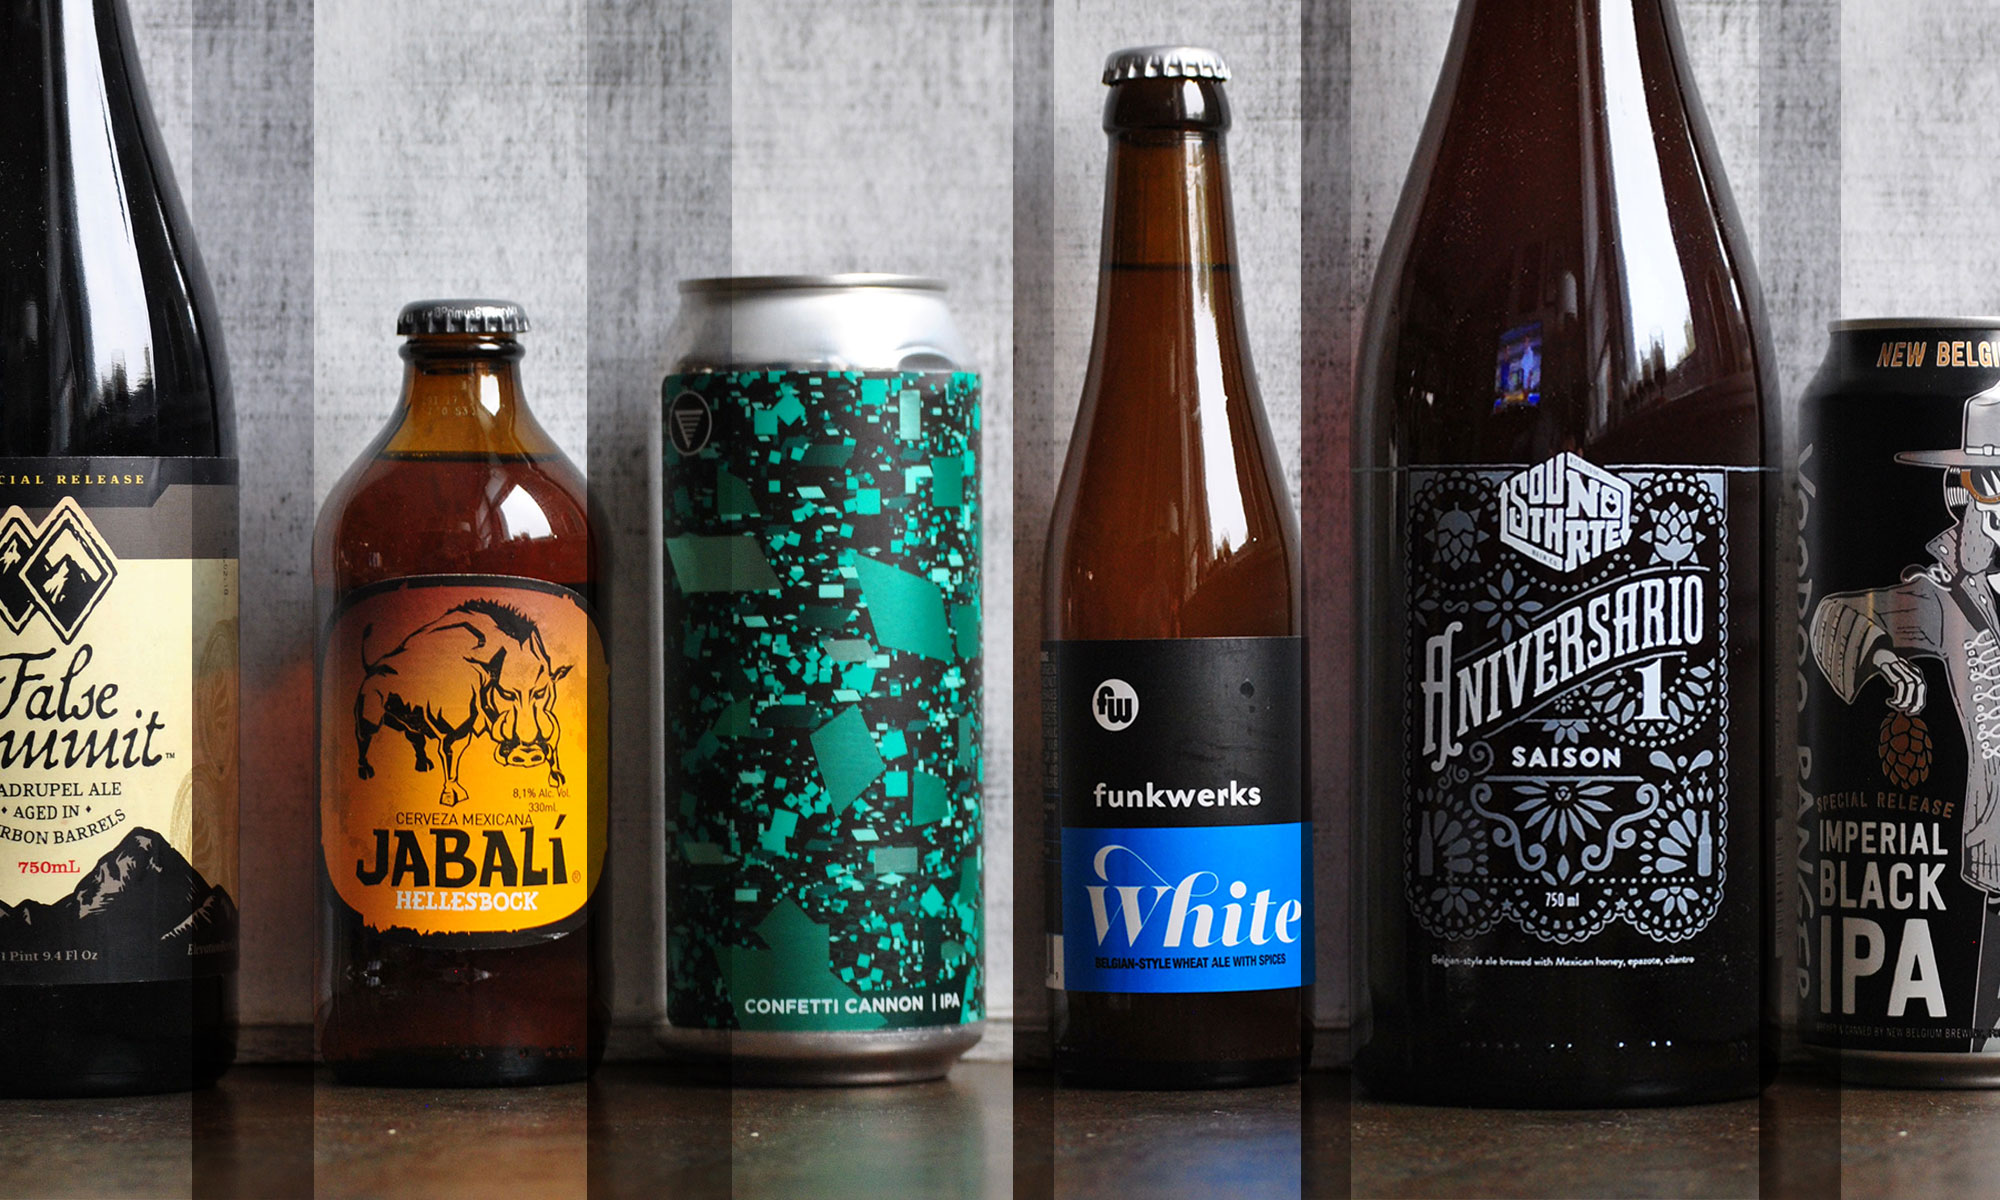 The Hop Reviews Vol. 30: A November Beer Review